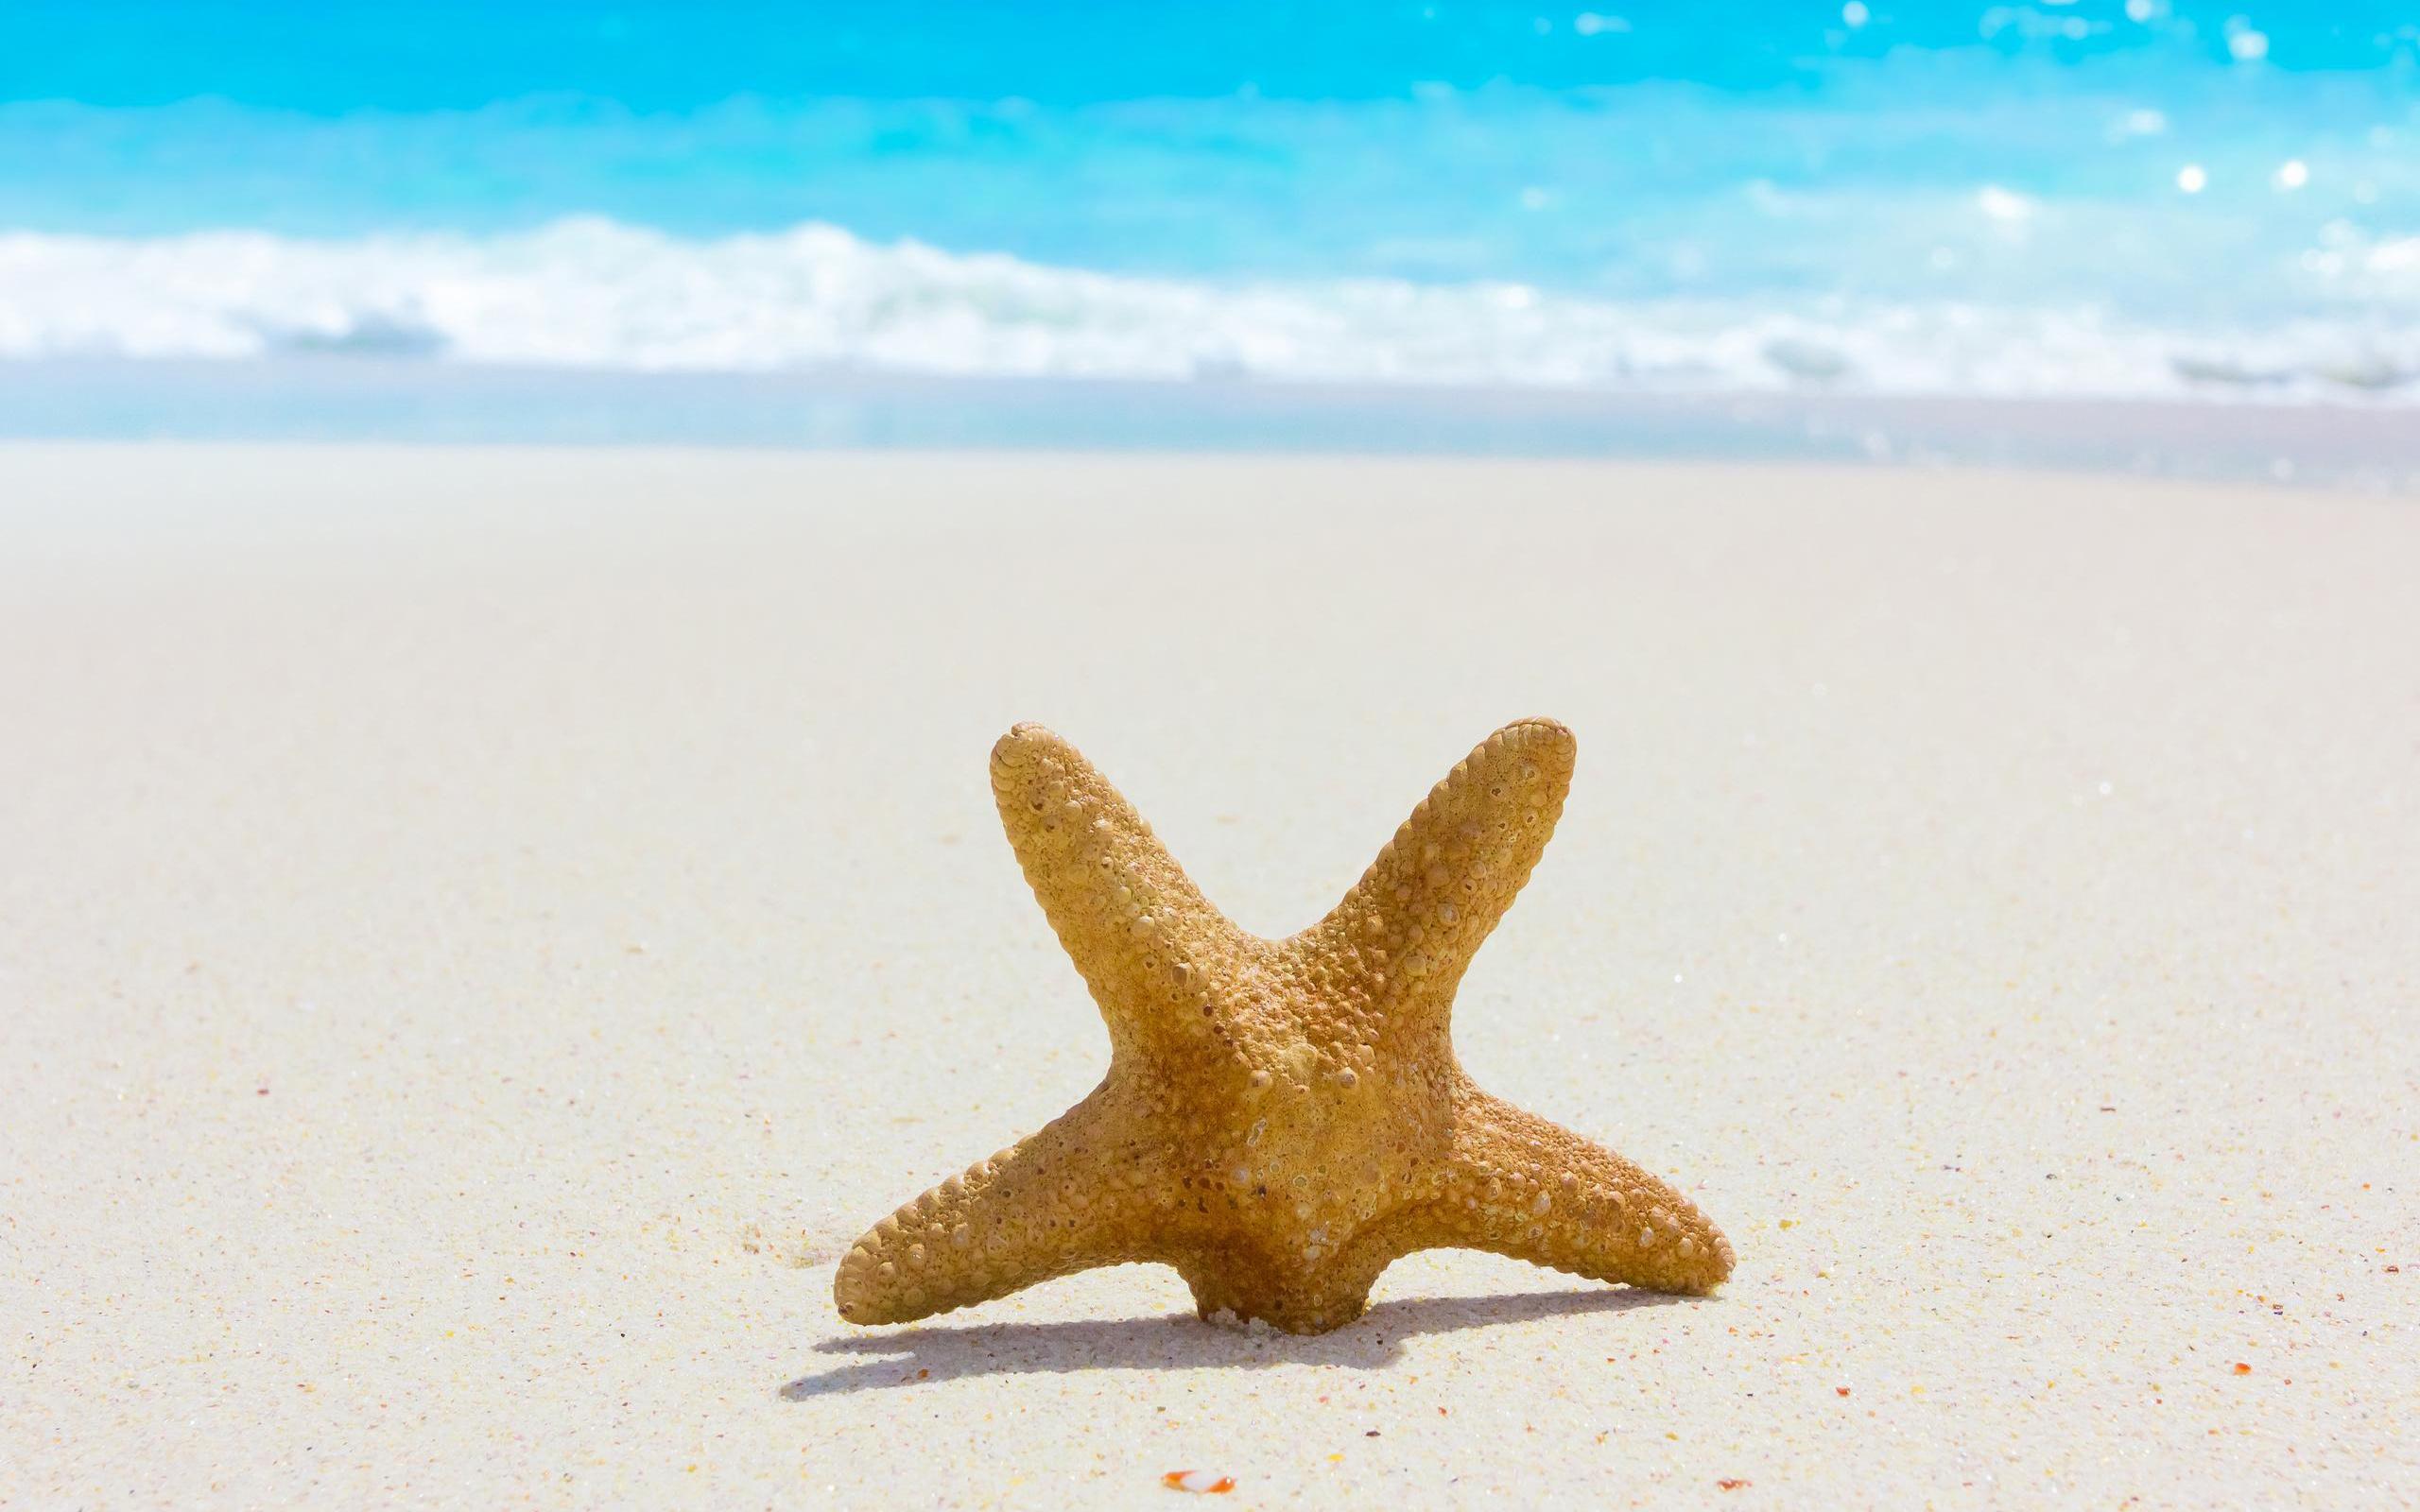 Starfish Wallpapers HD